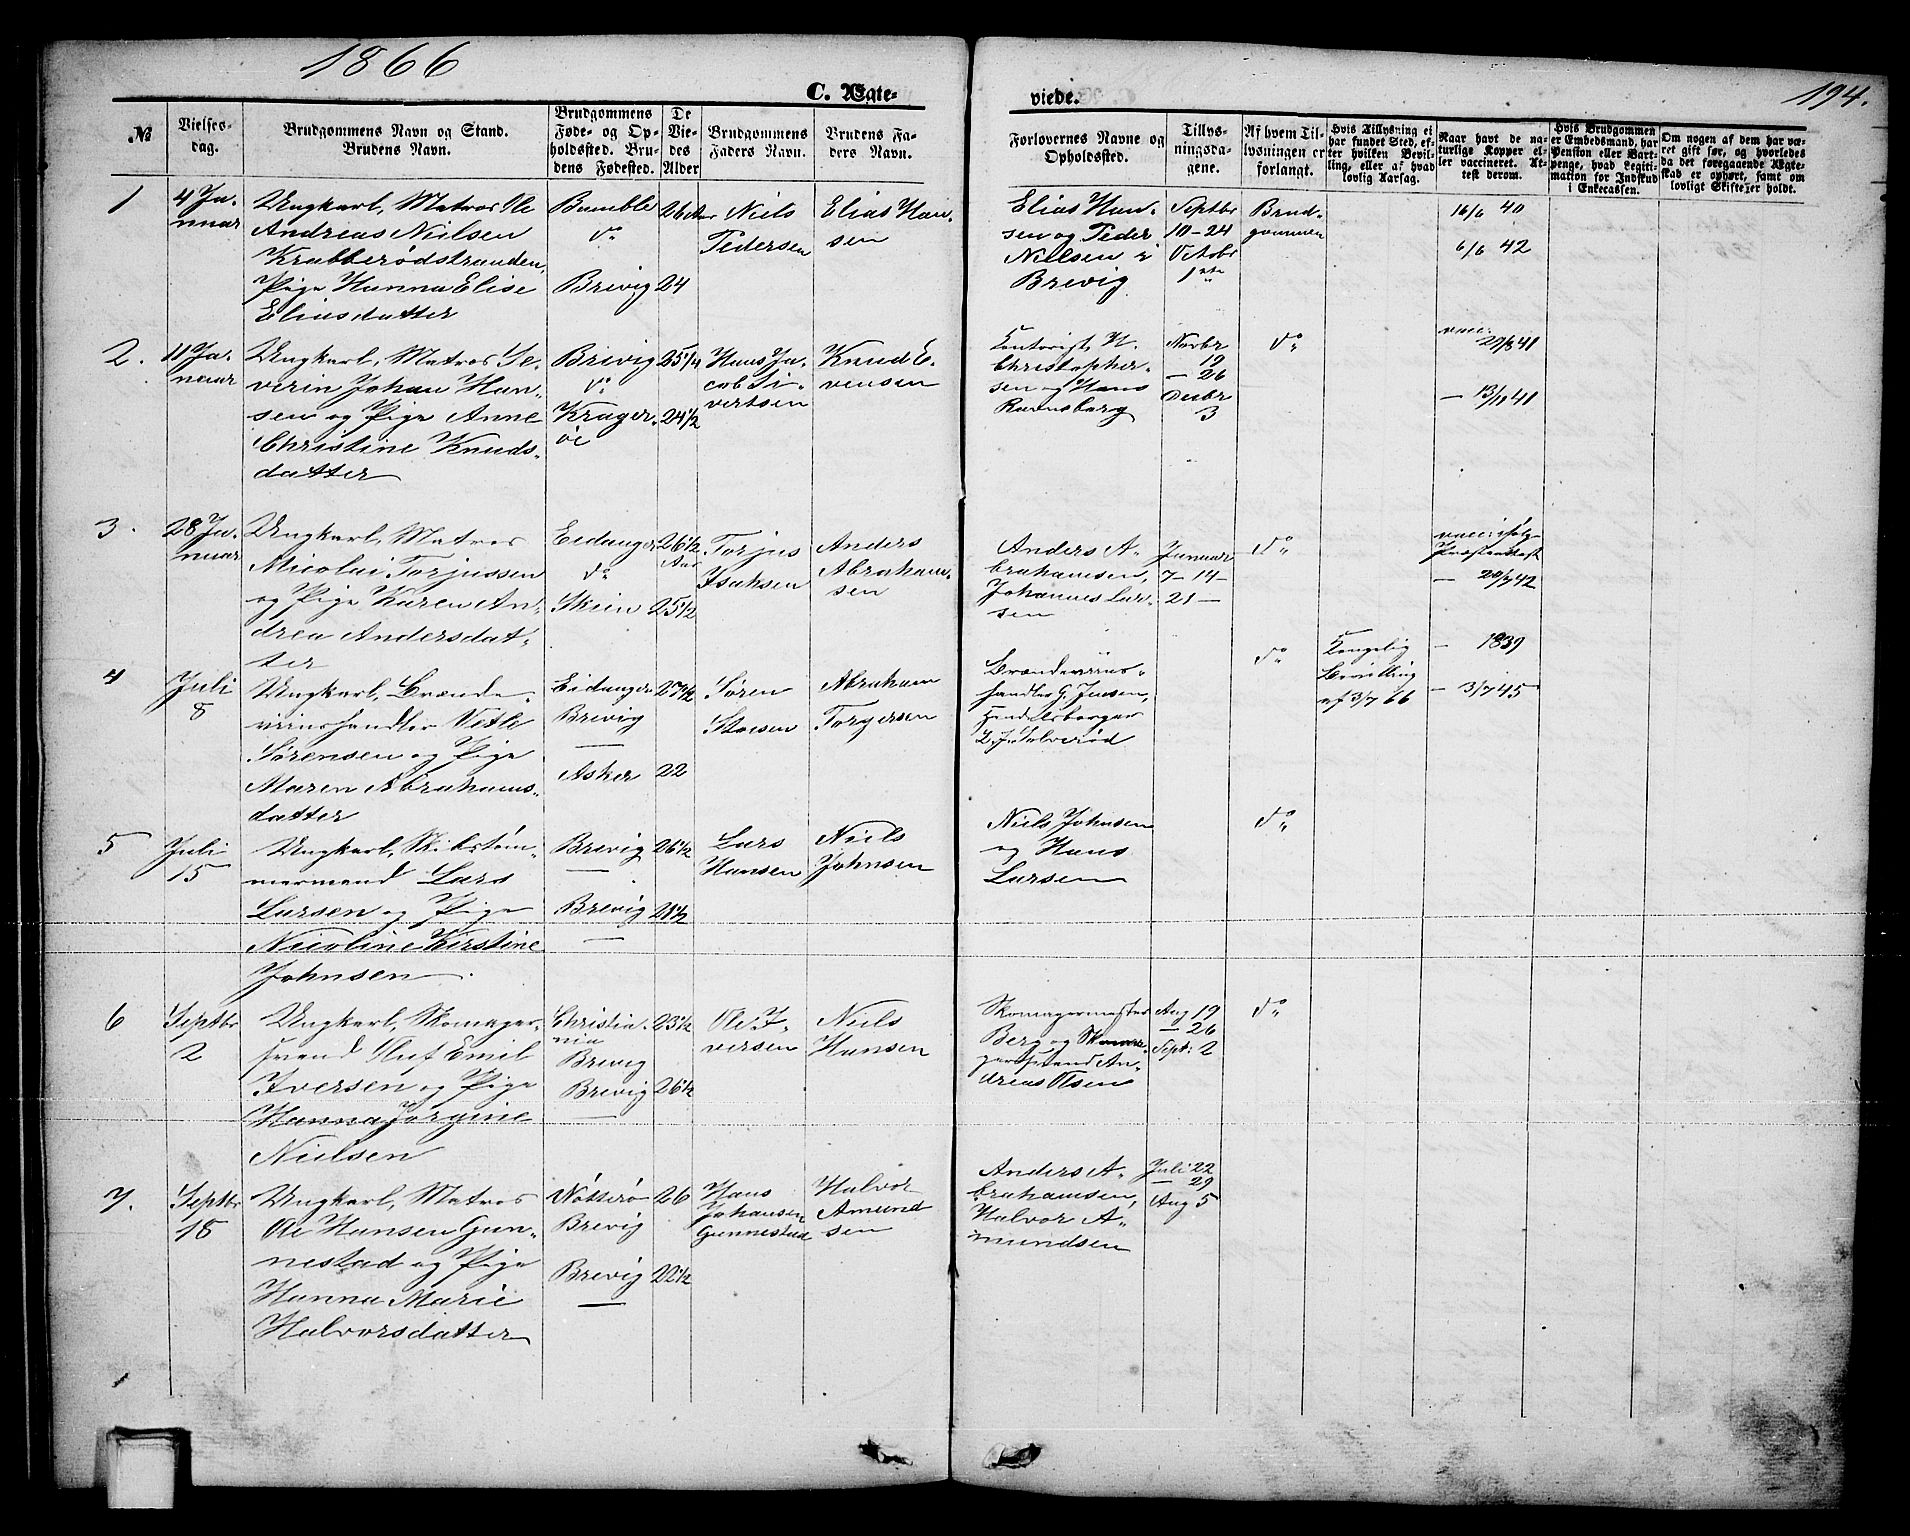 SAKO, Brevik kirkebøker, G/Ga/L0003: Klokkerbok nr. 3, 1866-1881, s. 194